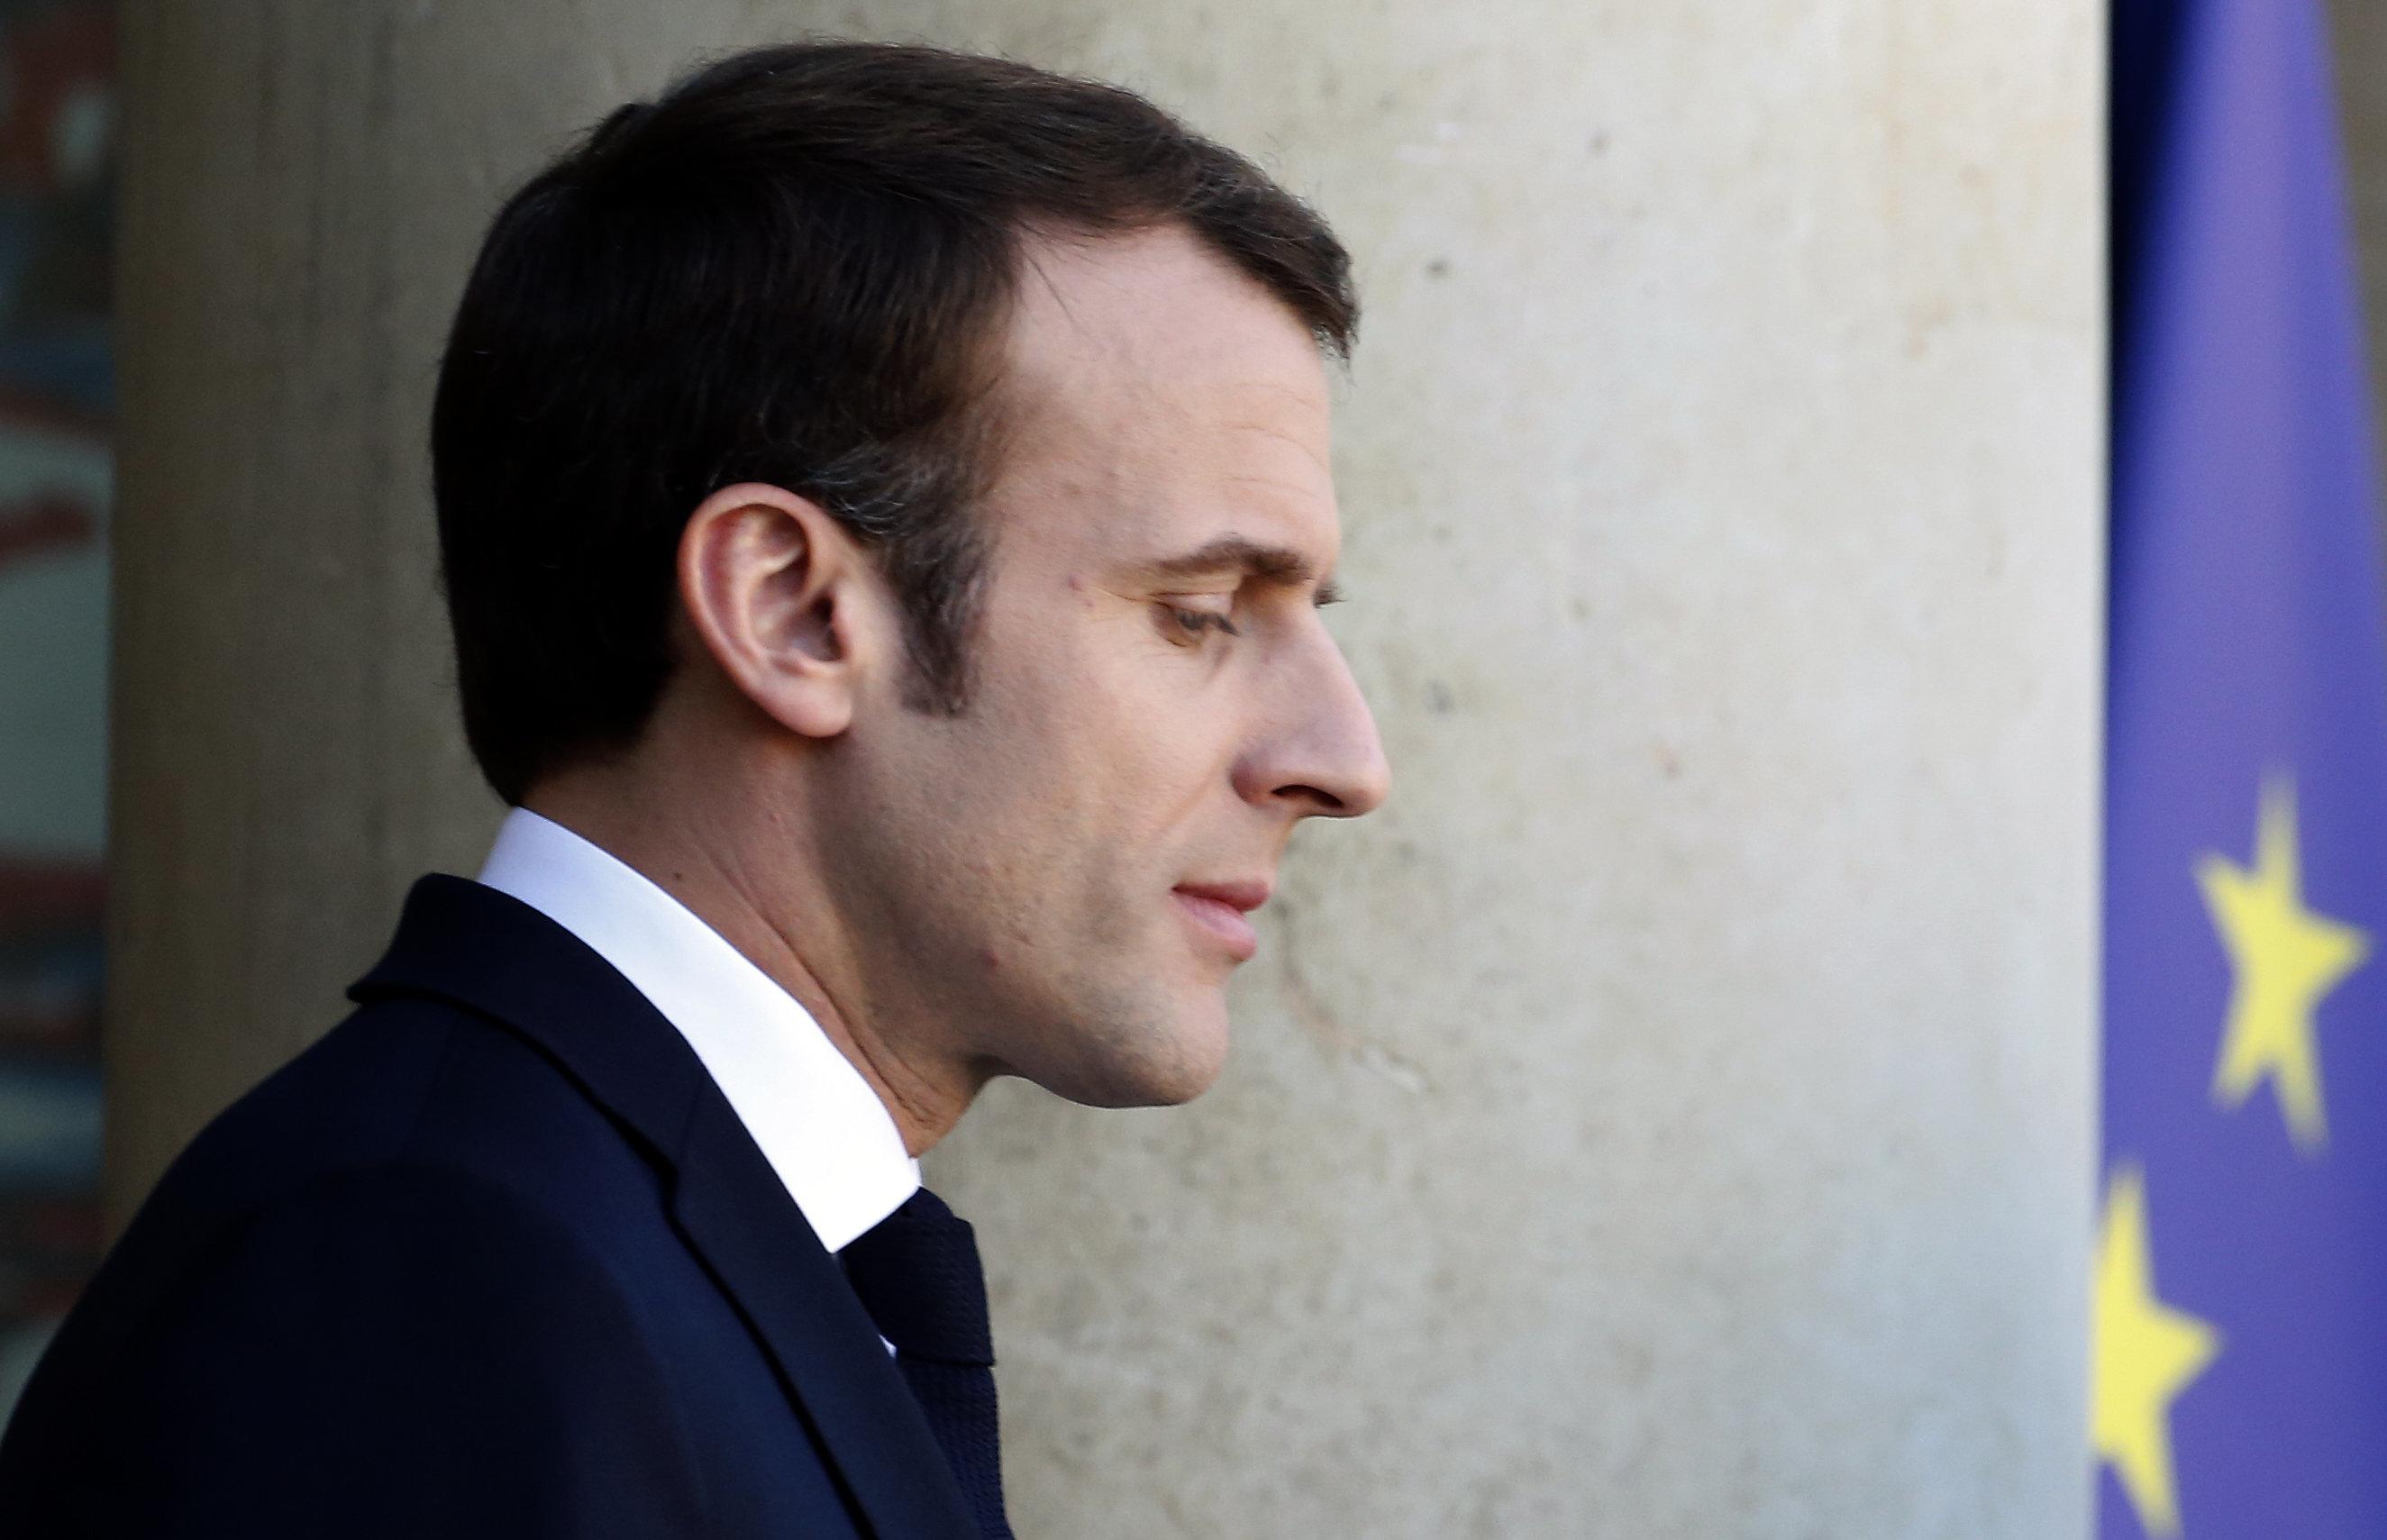 Emmanuel Macron fordert eine Reform der EU: So lauwarm reagiert